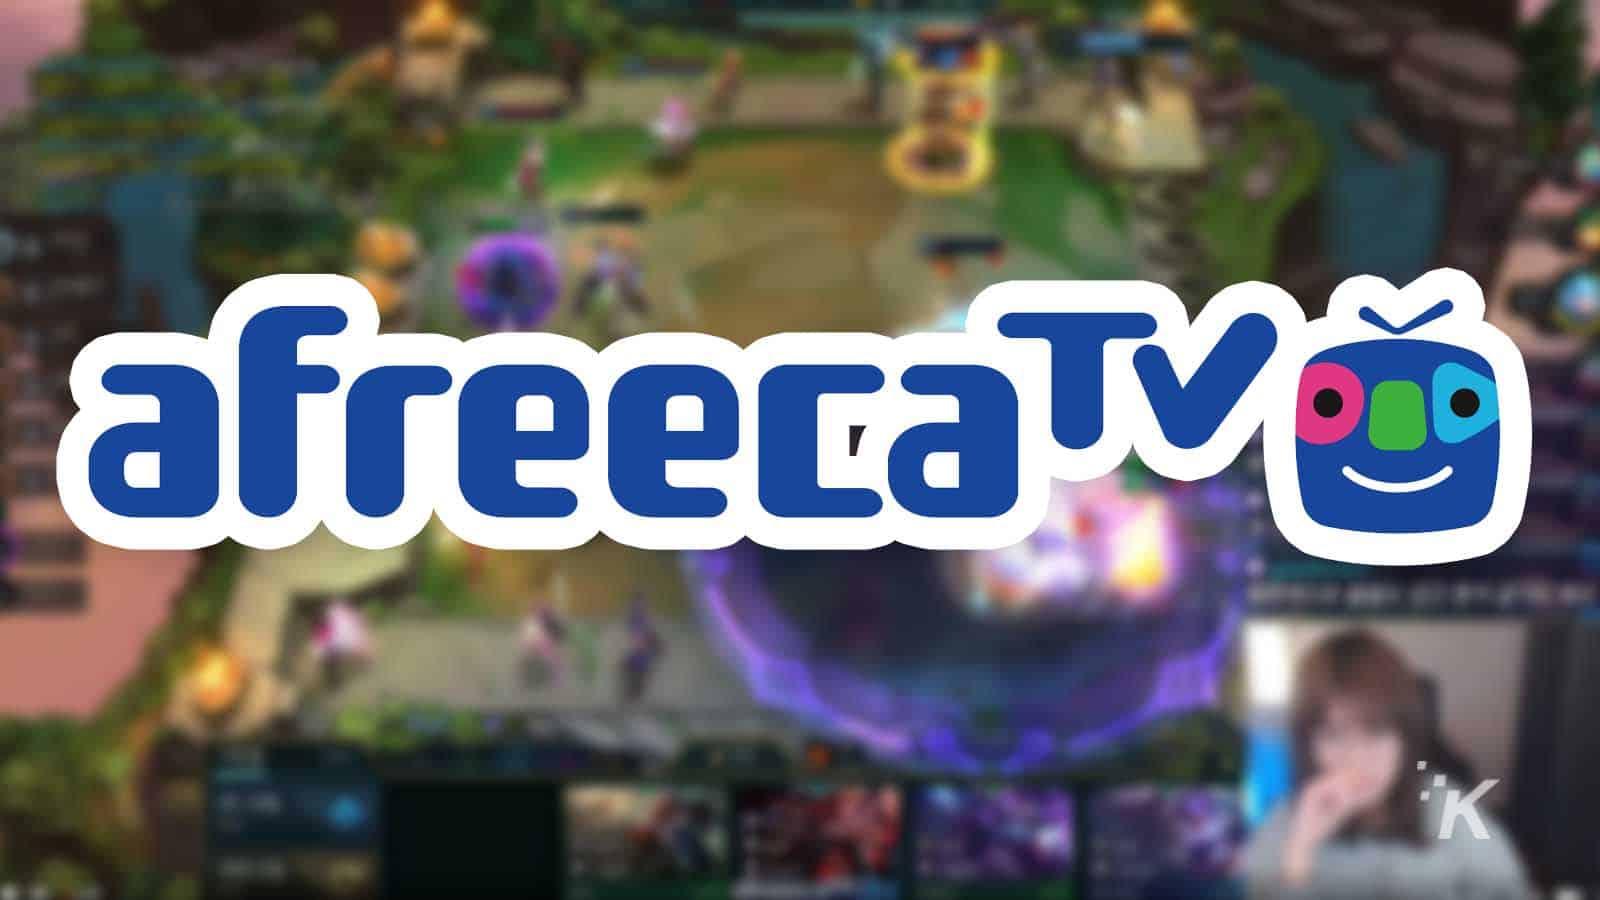 afreecatv streaming service